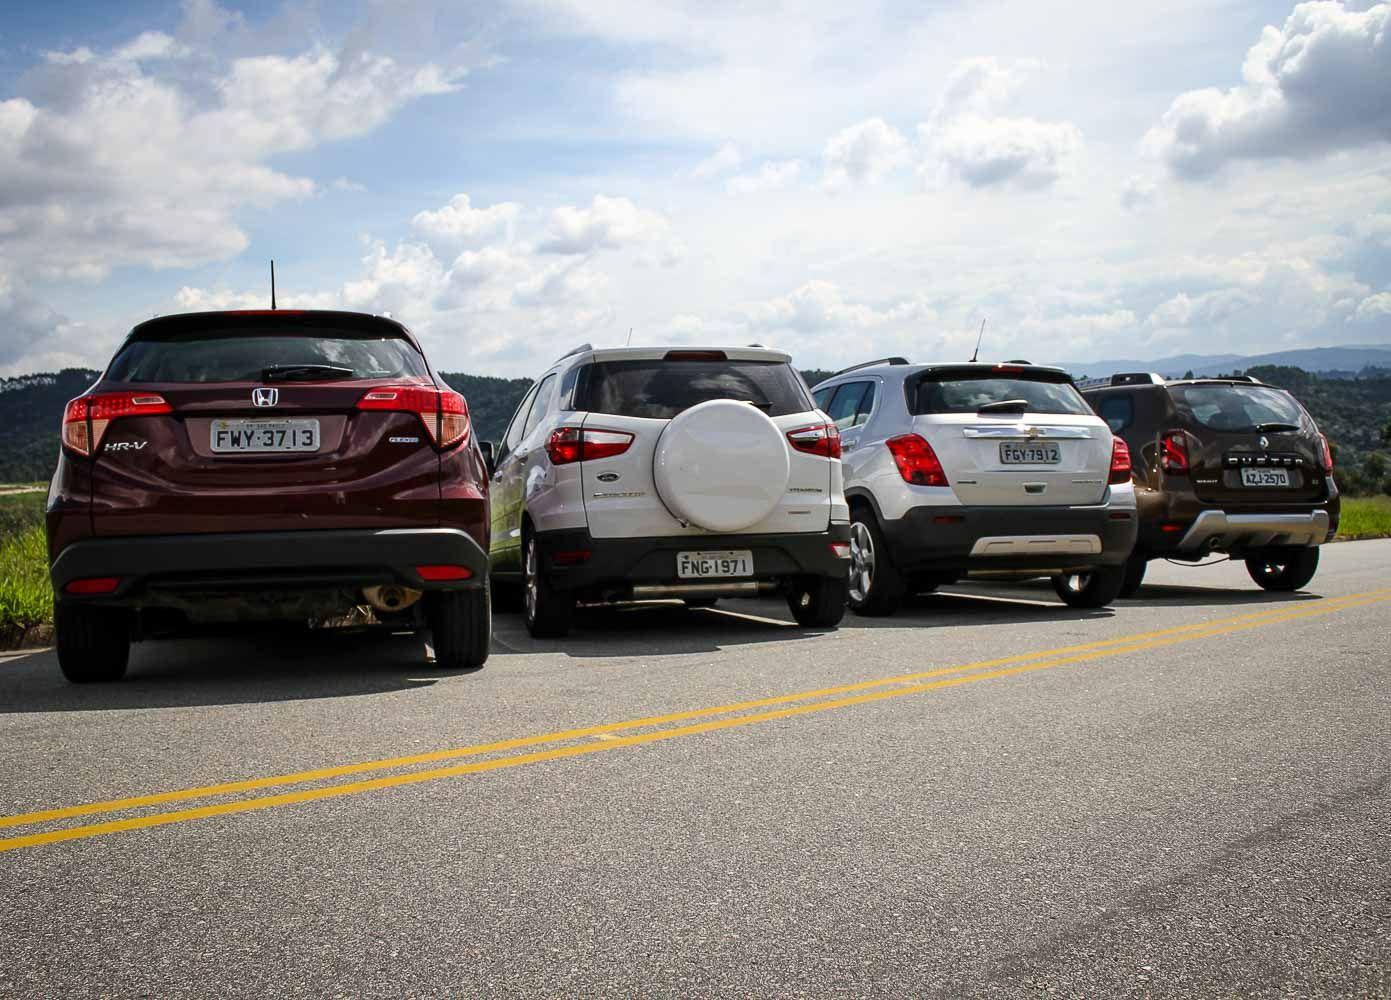 New Release Chevrolet Tracker Ltz Review Rear View Model